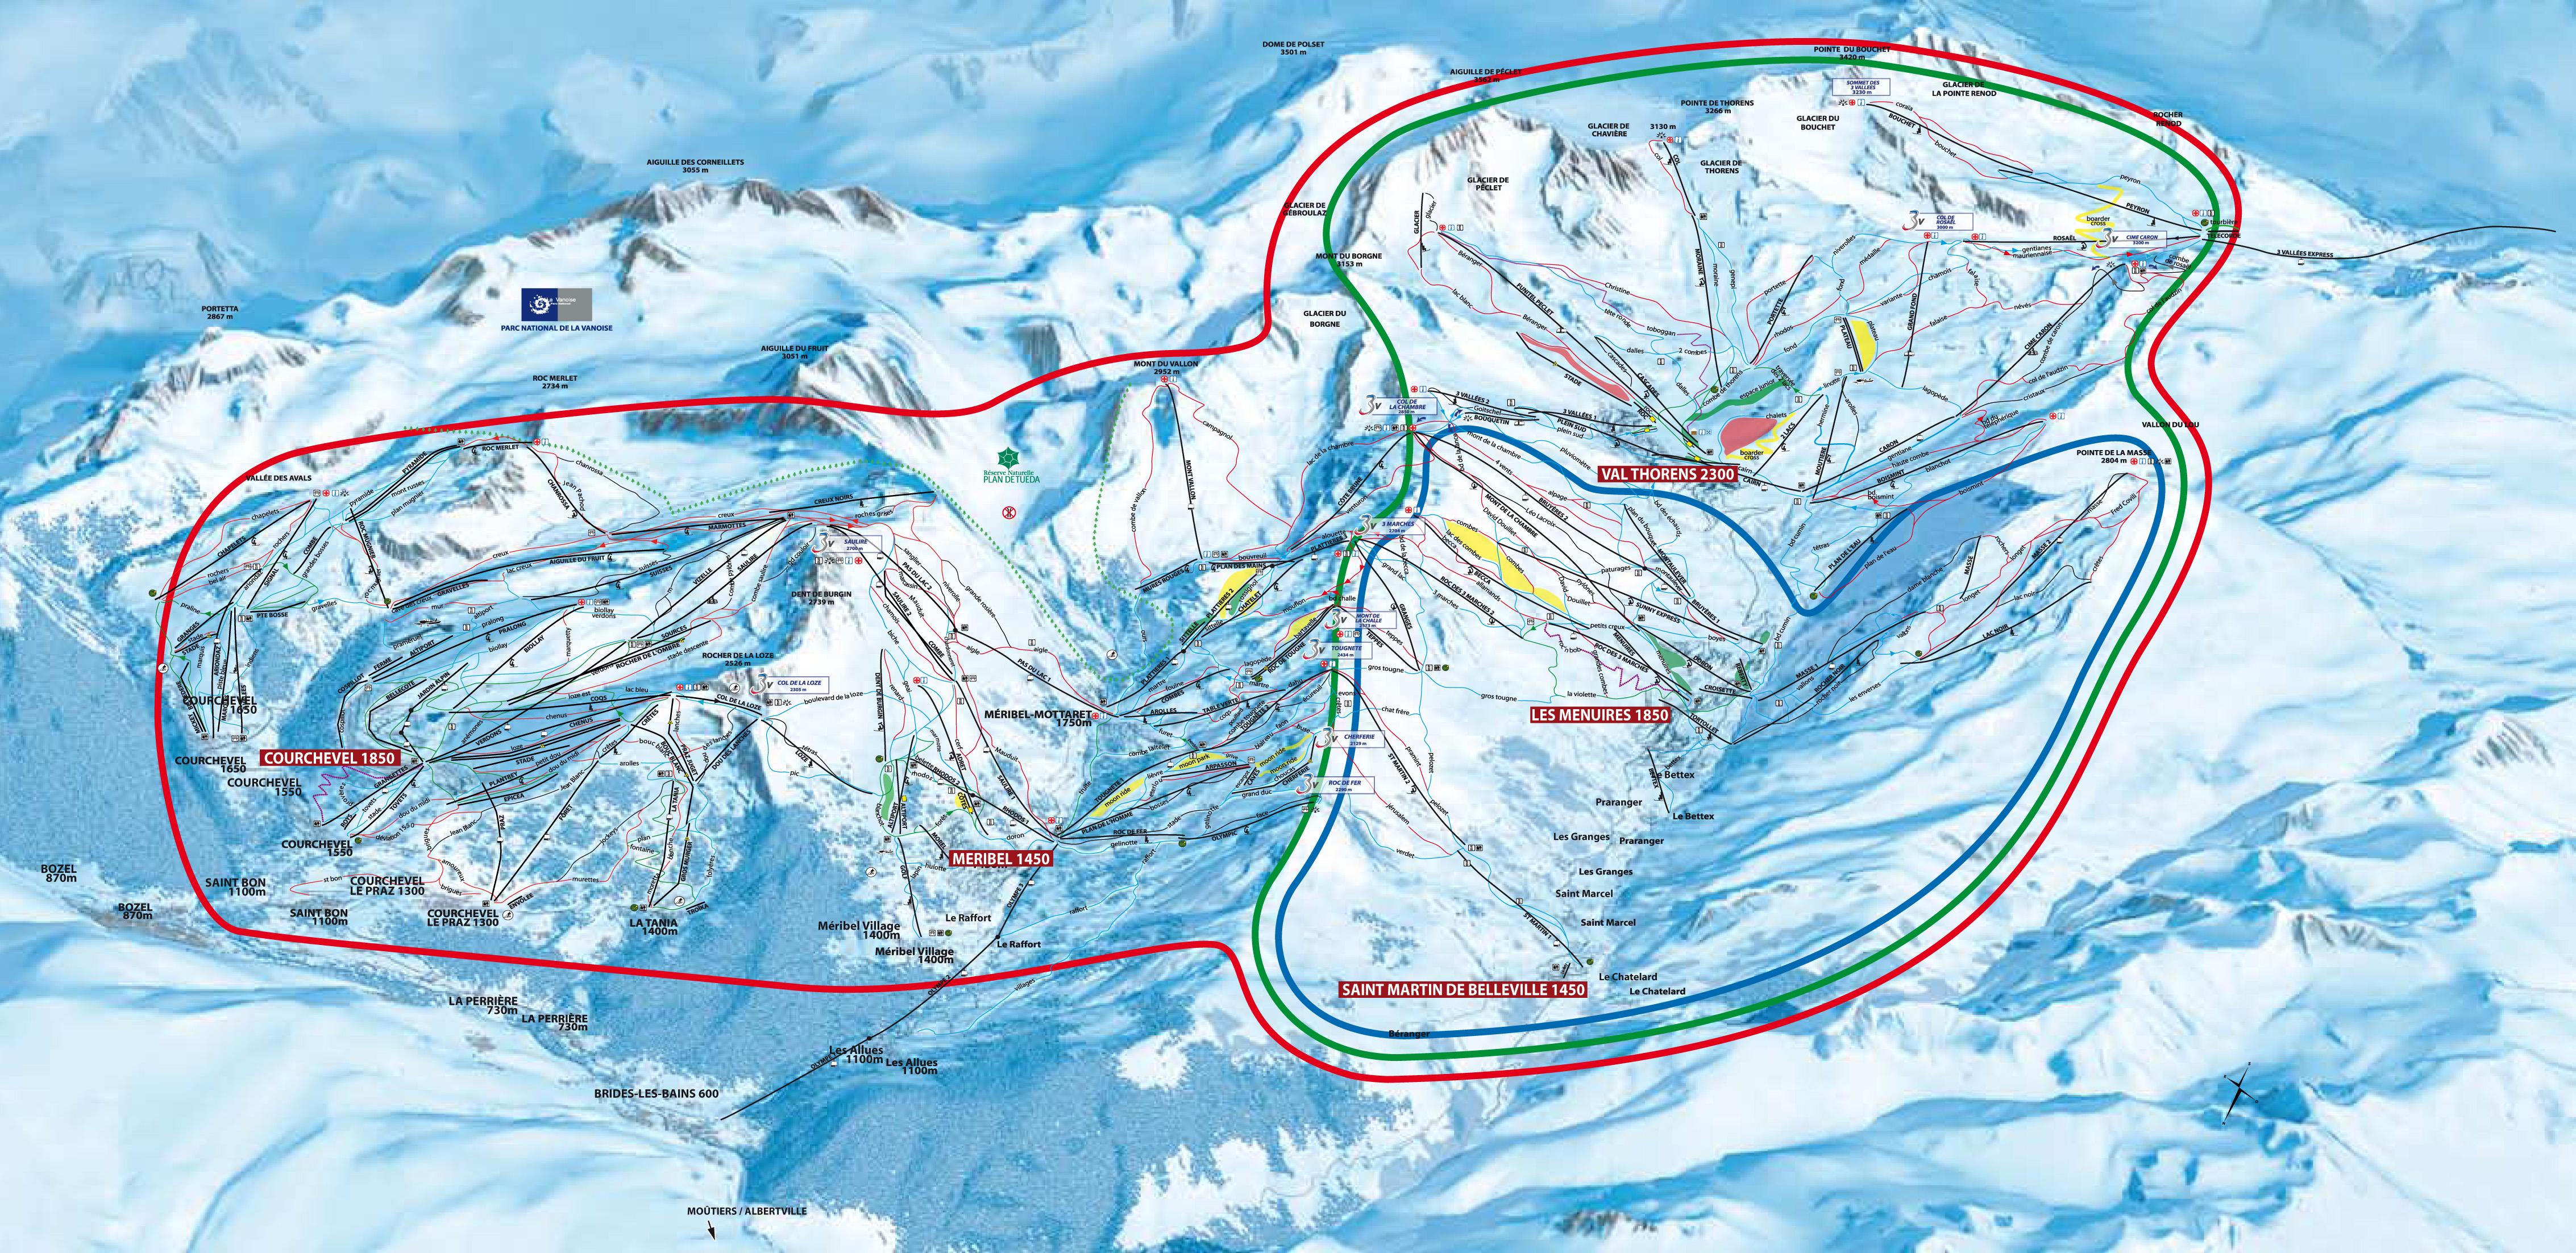 whistler ski runs map with Saint Martin De Belleville on 56 110279 17269684 Wlochy  Slowacja  USA   najciekawsze osrodki narciarskie in addition Mont Tremblant map slopes besides Monashee Mountain Cats further Skiing further Piste Map Blue Mountain Ski Maps.